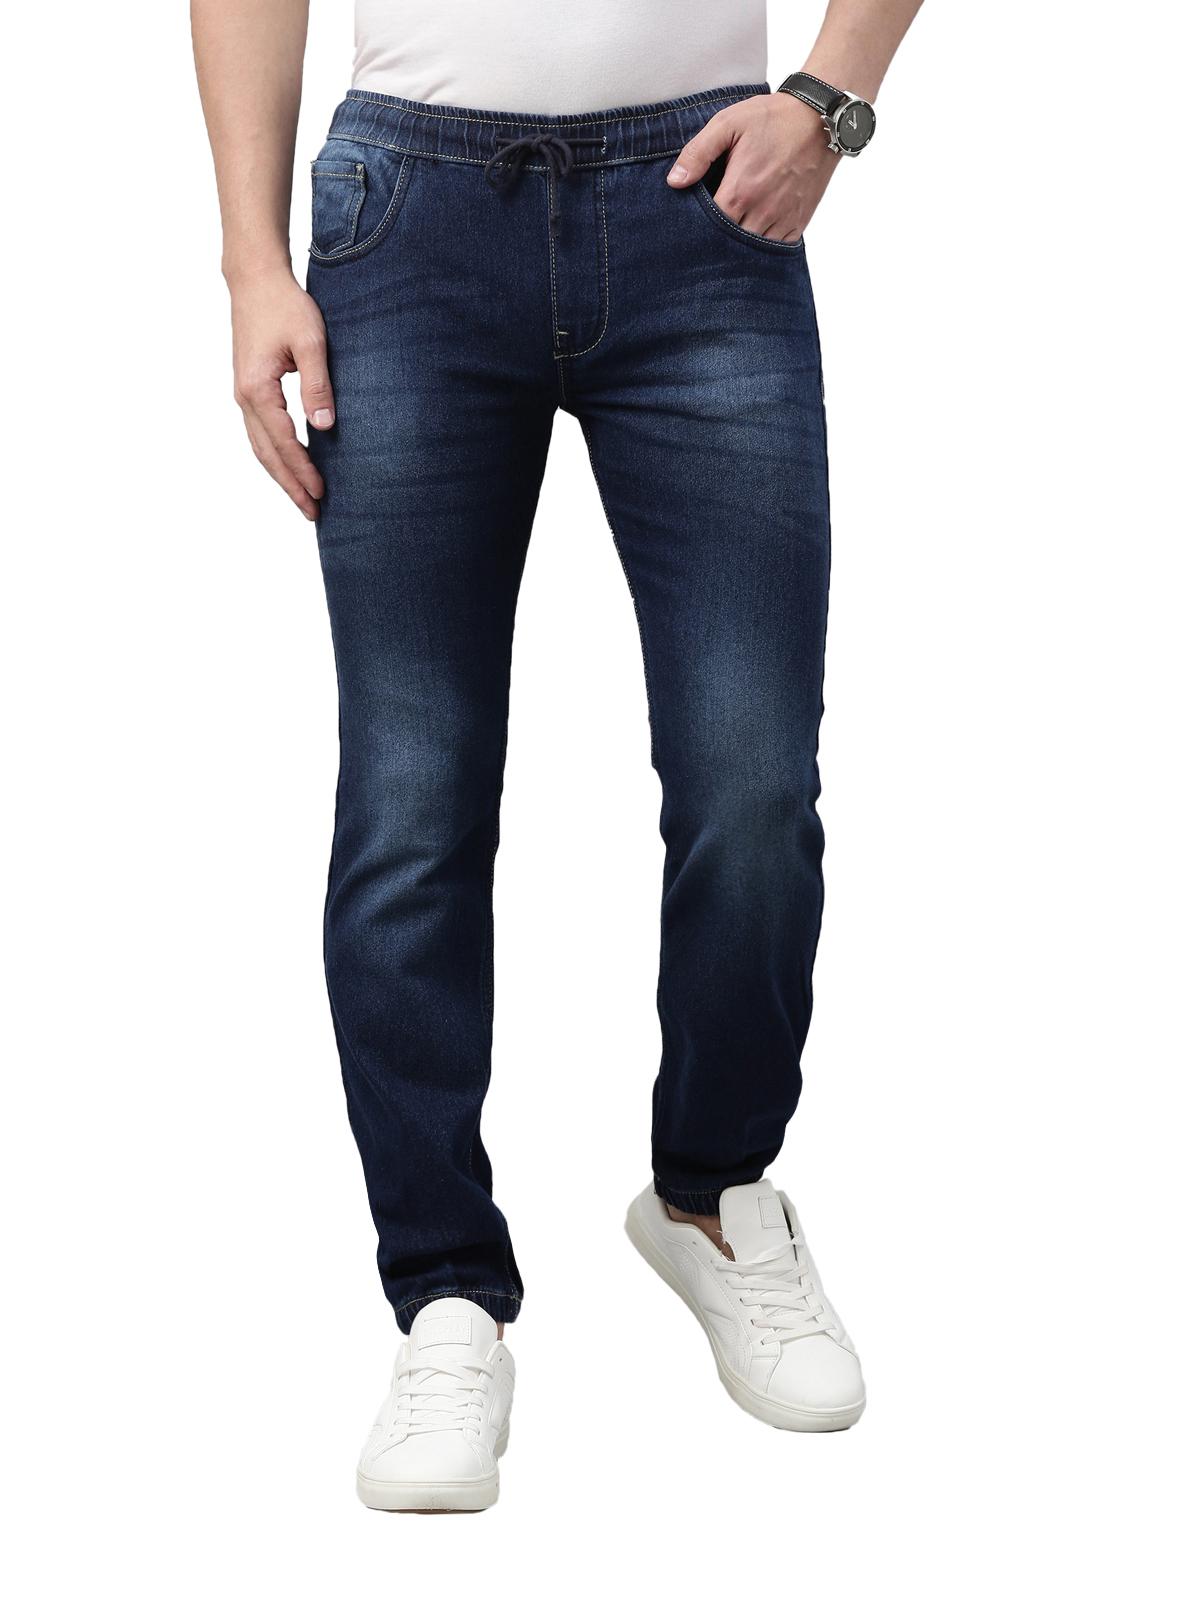 Chennis | Chennis Mens Jogger Jeans